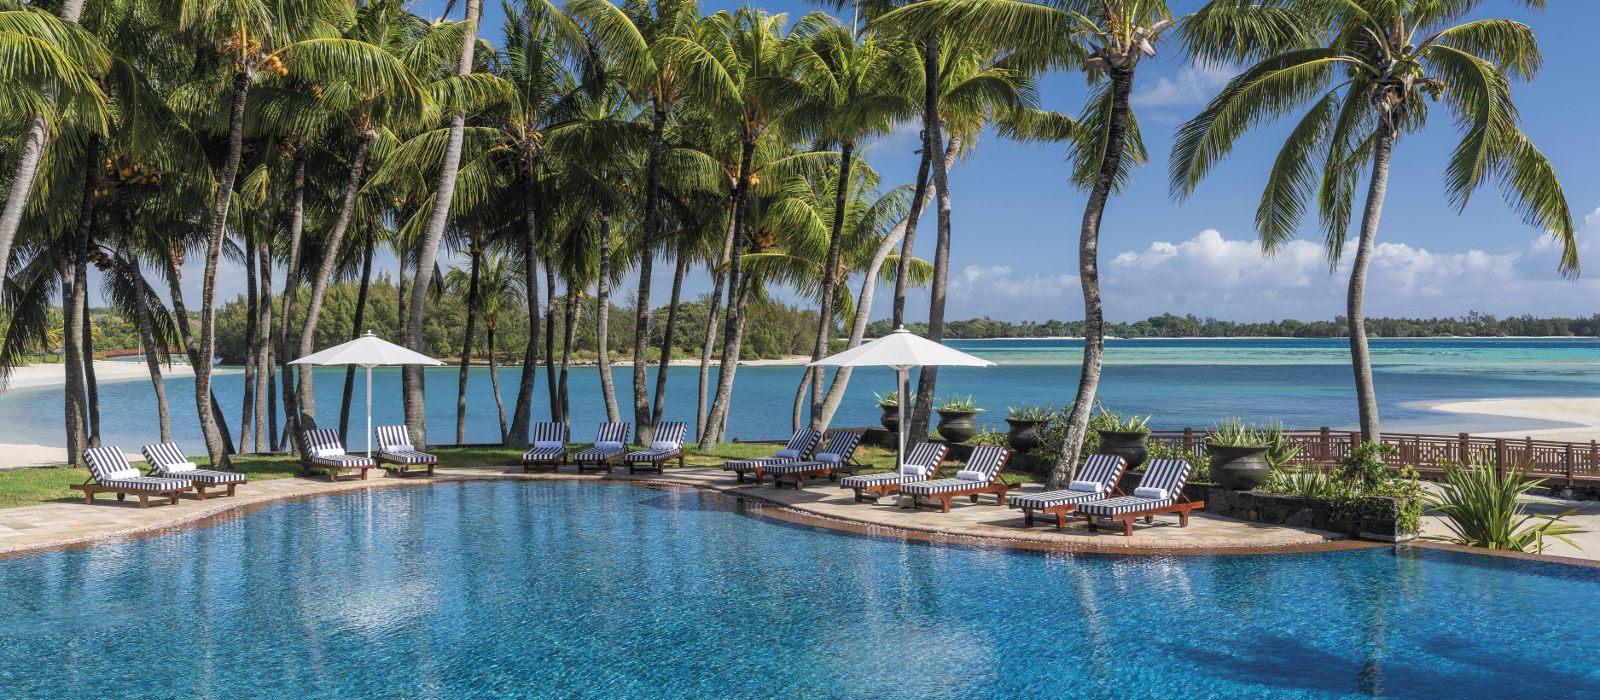 Hotel Shangri La S Le Touessrok Resort Spa Mauritius